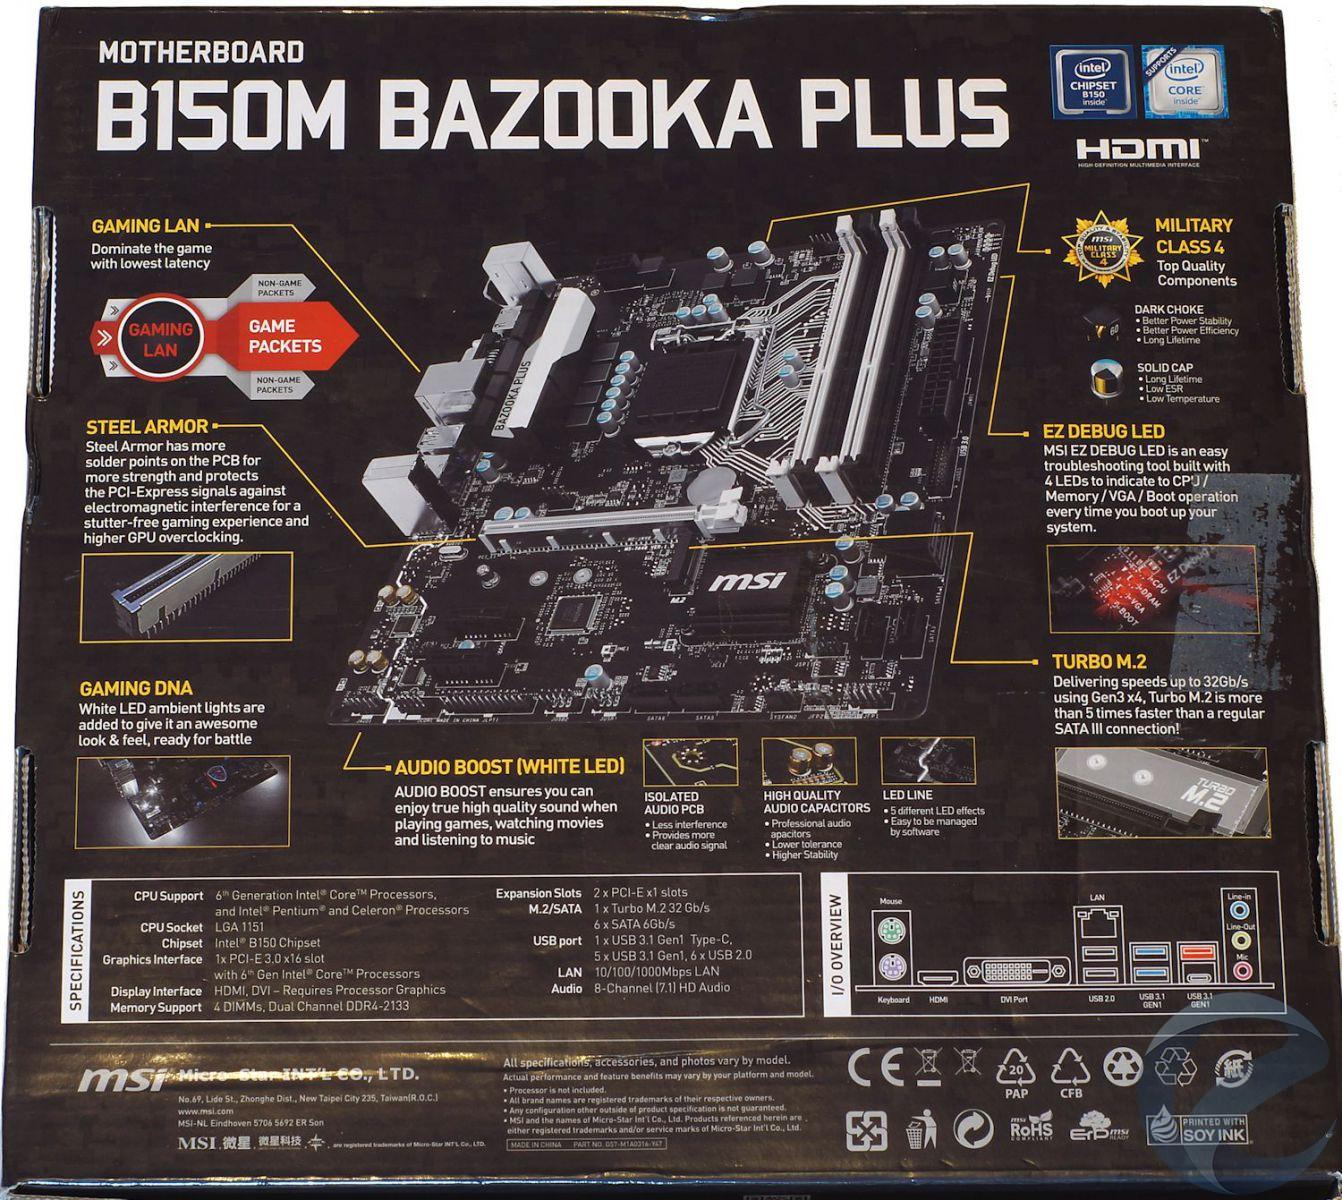 Упаковка и комплектация материнской платы MSI B150M BAZOOKA PLUS